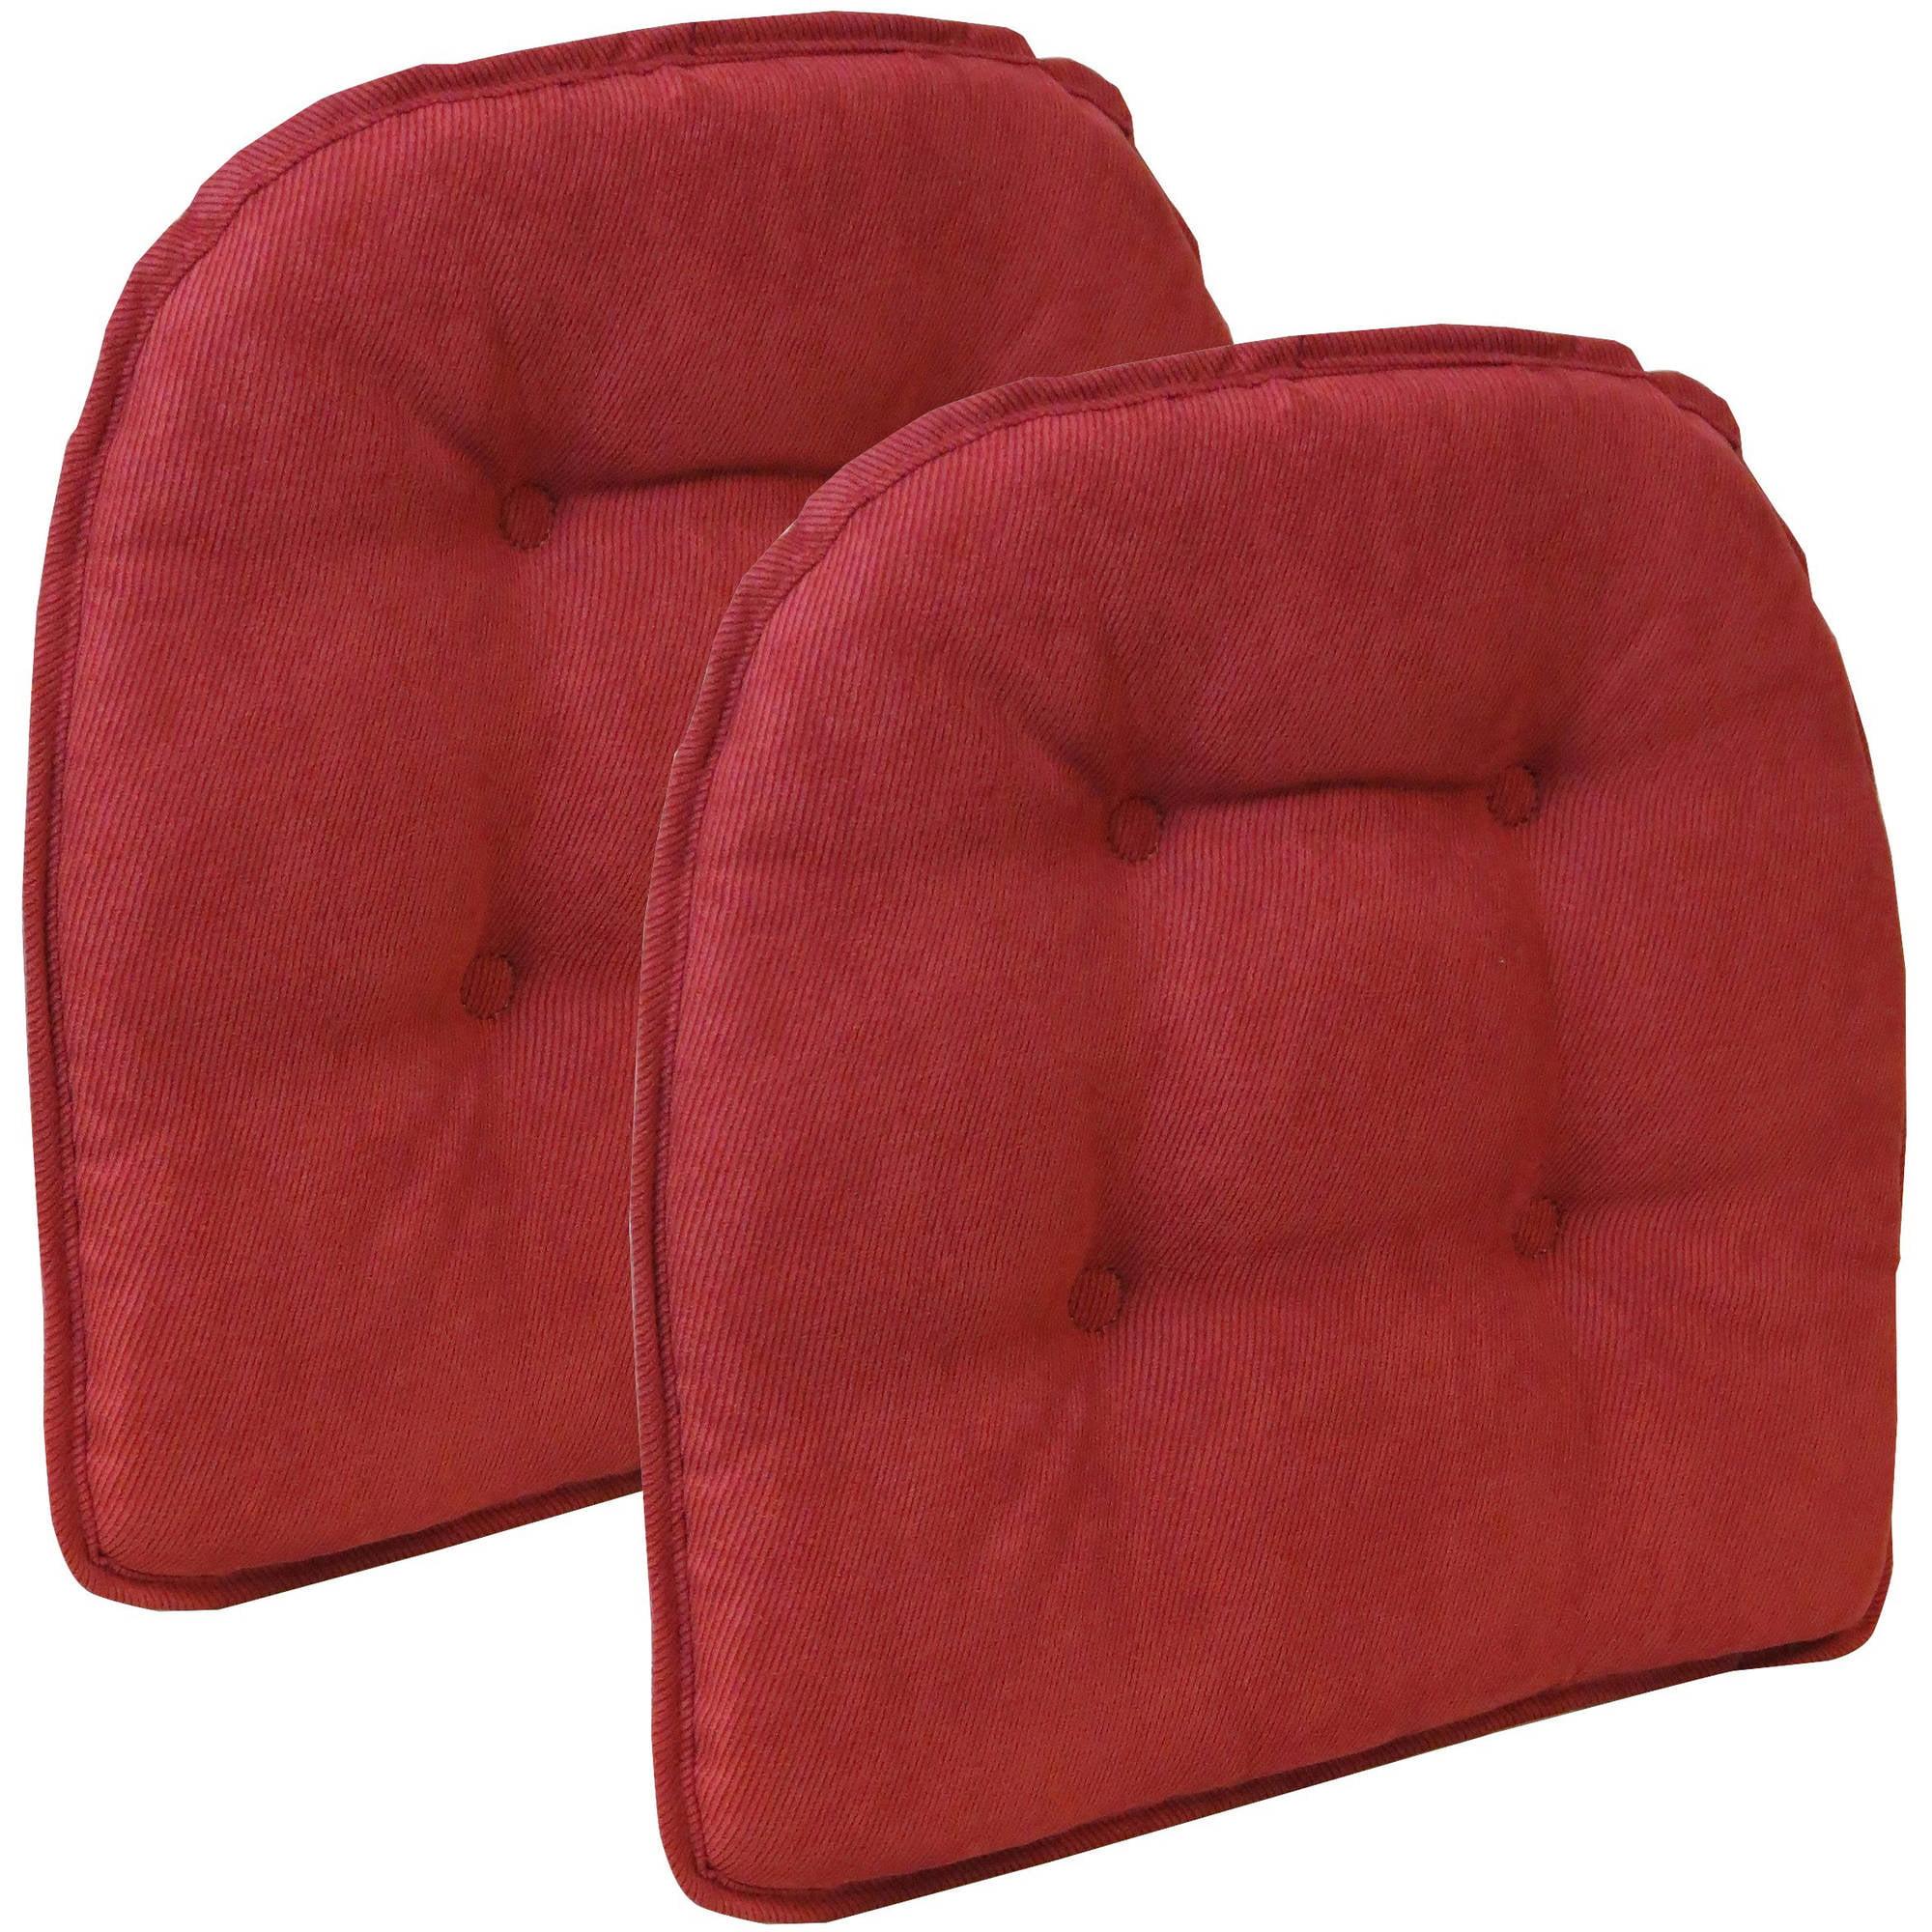 Gripper Non-slip Nouveau Tufted Chair Cushions, Set of 2 ...